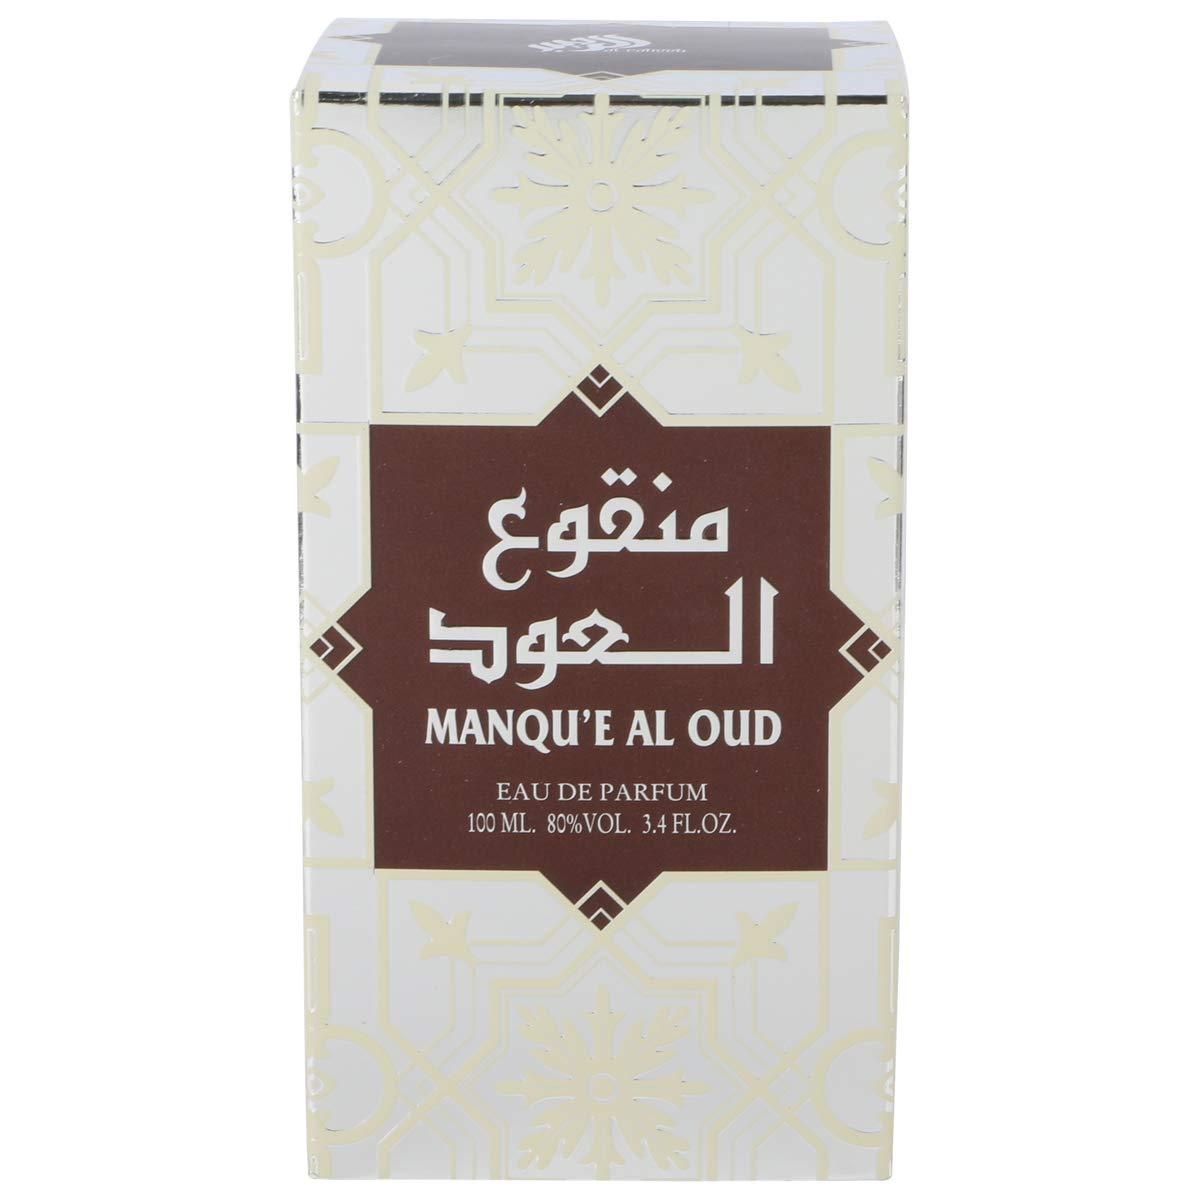 ede0cf0fc Manque Al Oud Perfume by Lattafa for Unisex, 100ml, Eau de Parfum:  Amazon.ae: OctupusStore